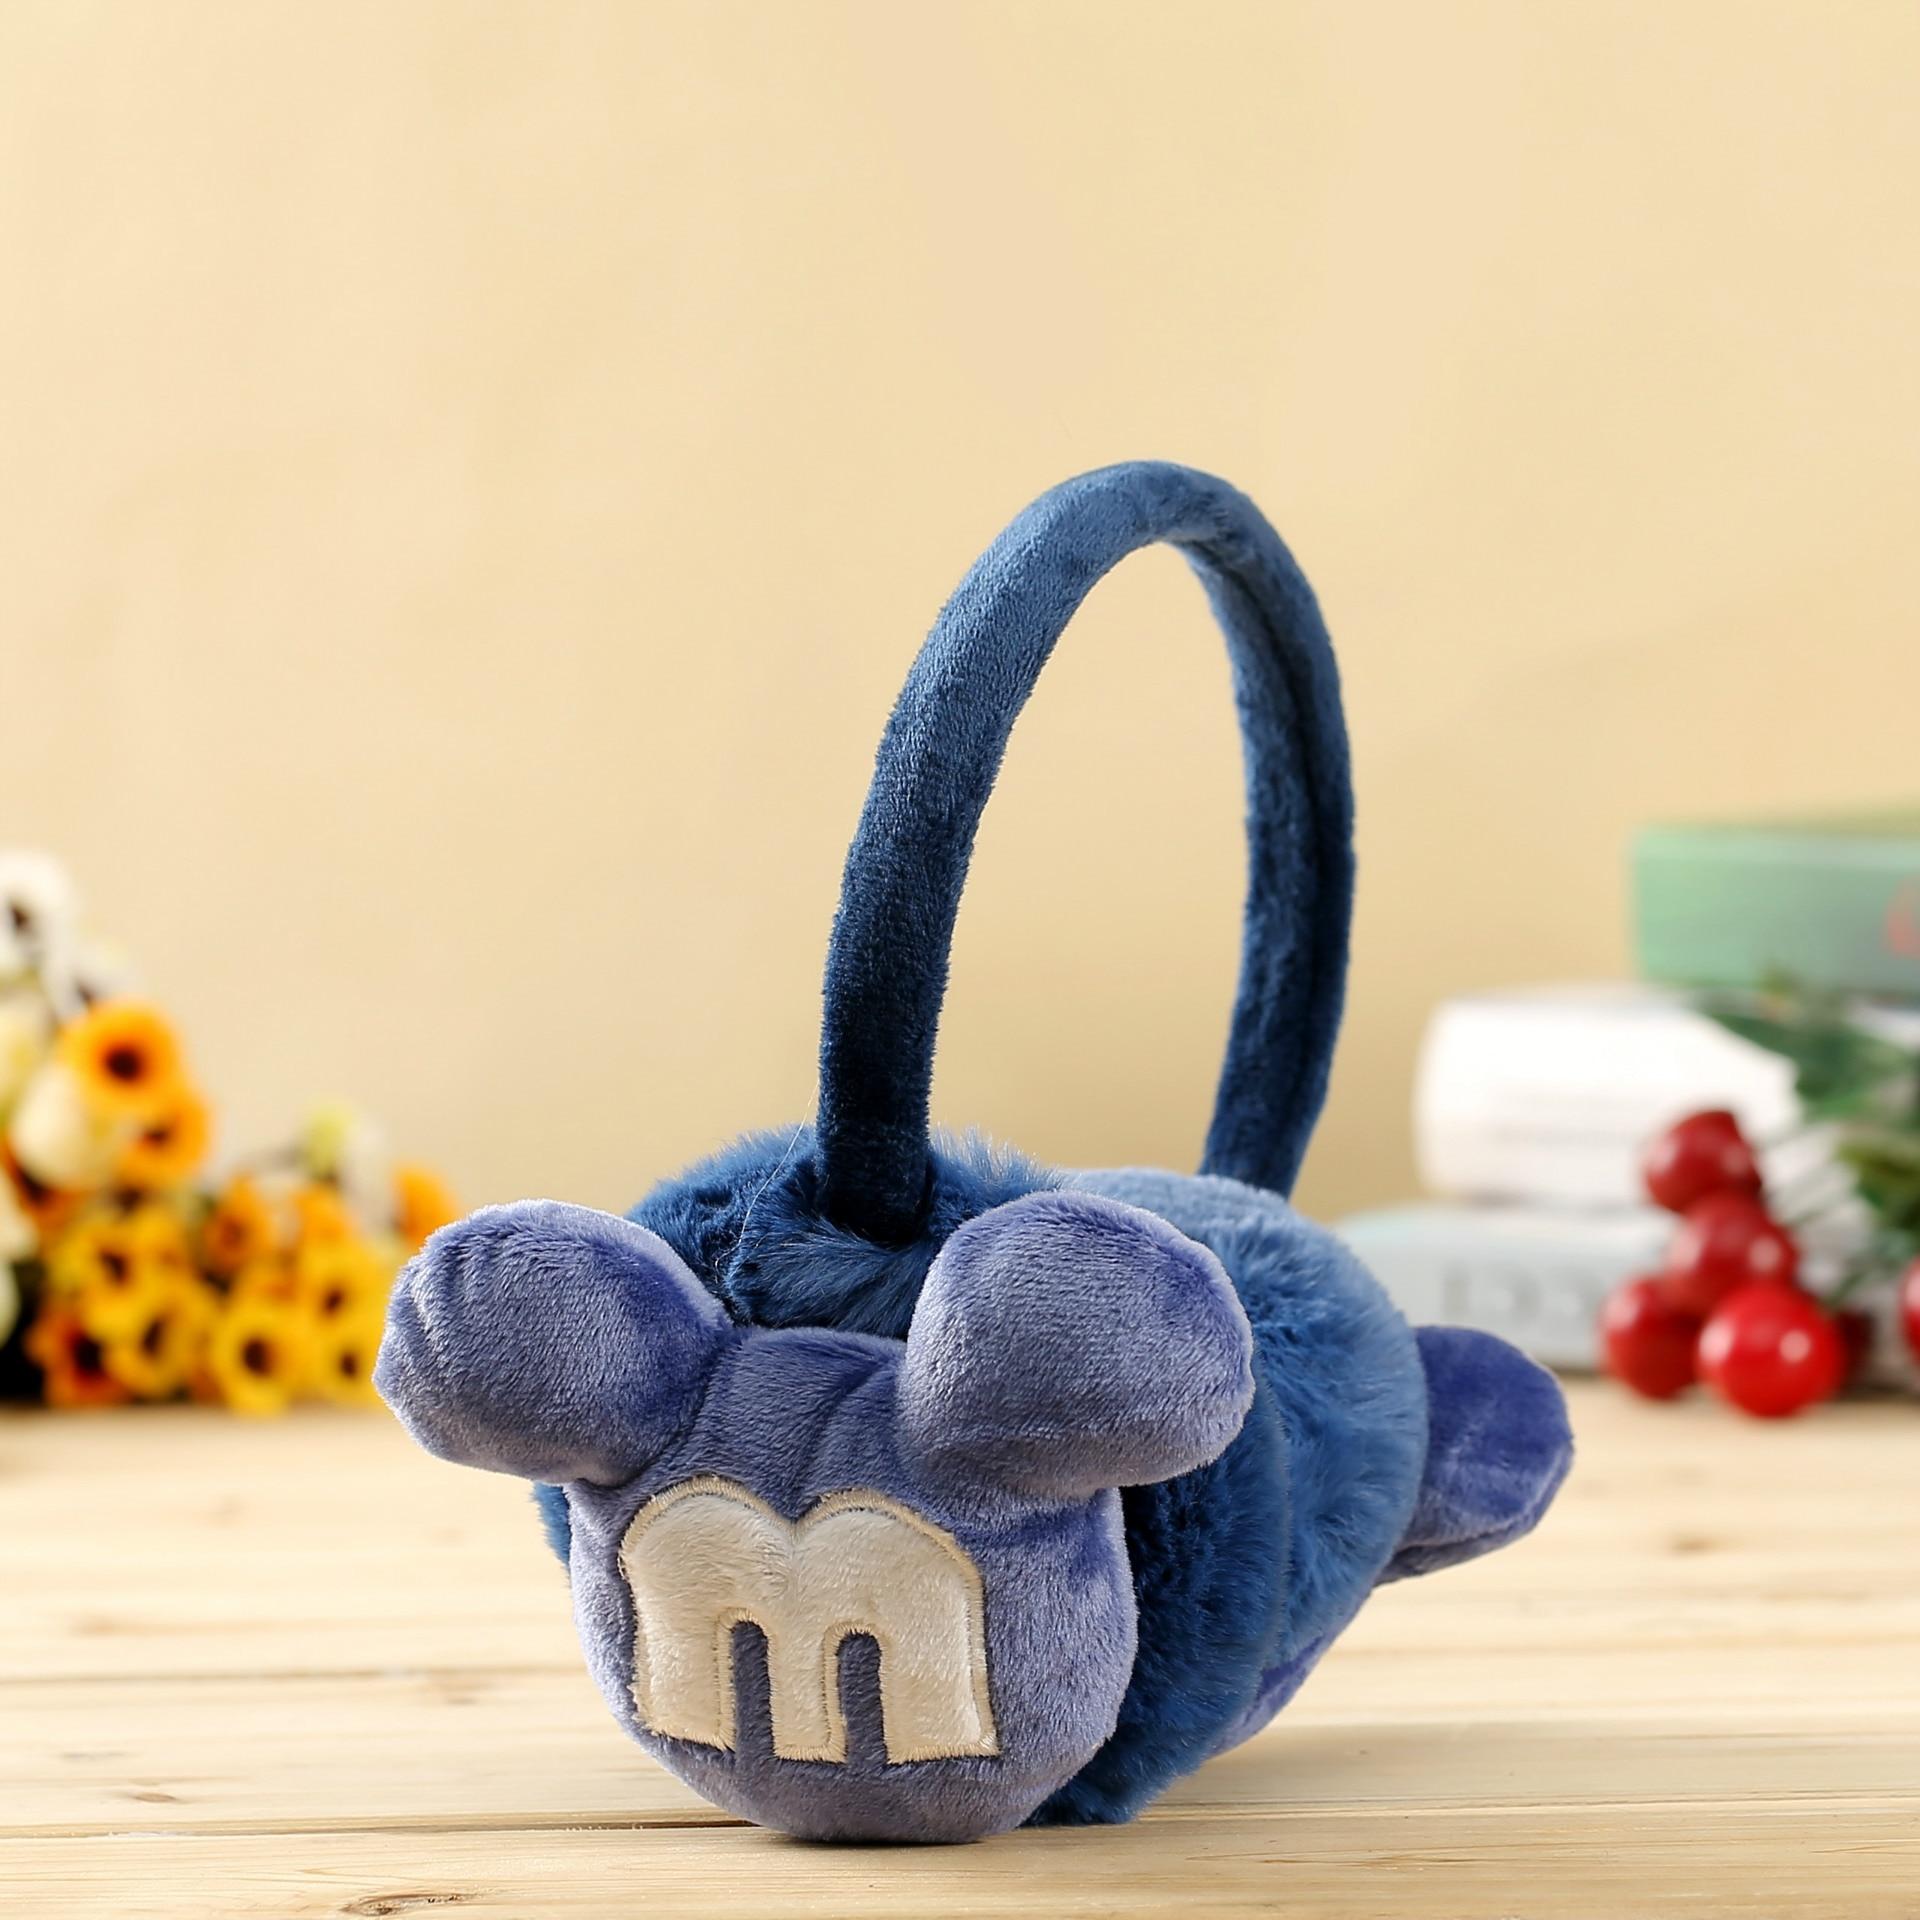 New Design Winter Earmuffs For Women Girls Boys Cute Mouse Earmuffs Warmers Winter Comfortable Warm Winter Earmuffs E009-blue